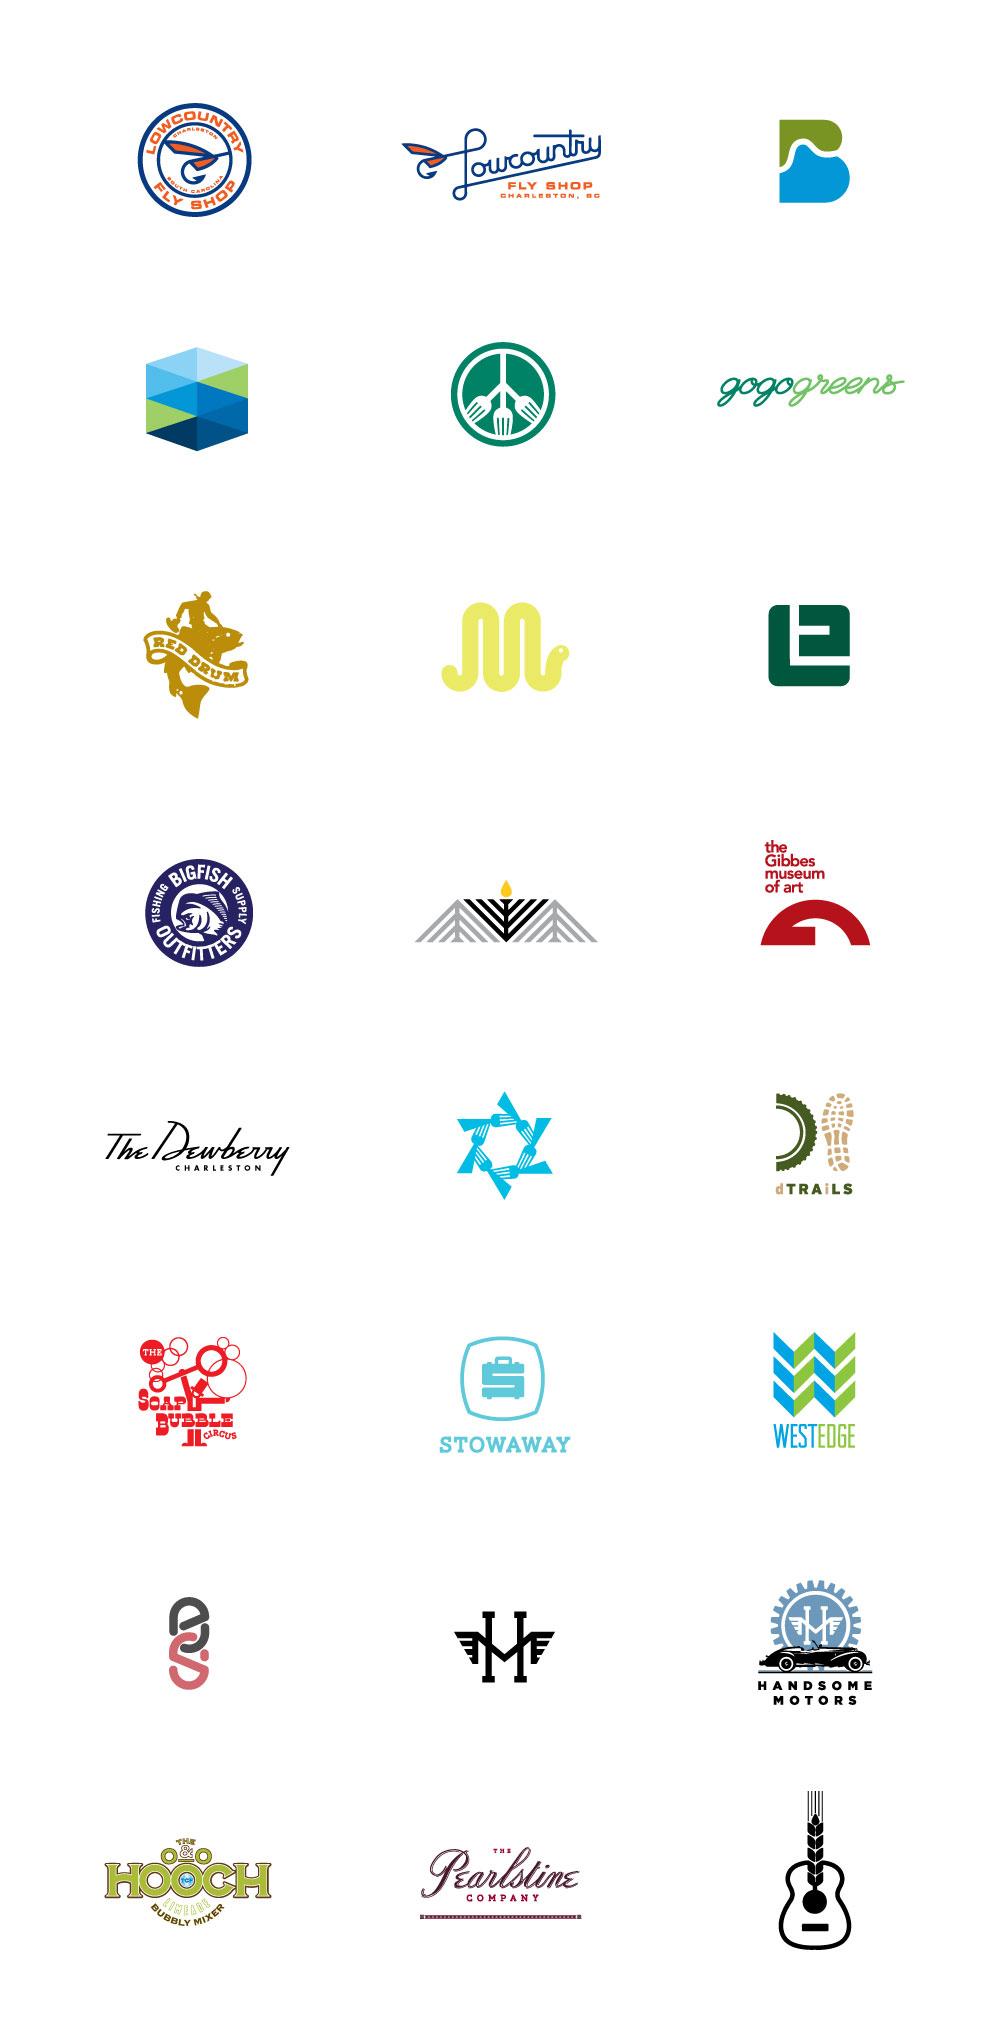 gsgd_logos_2016_1.0